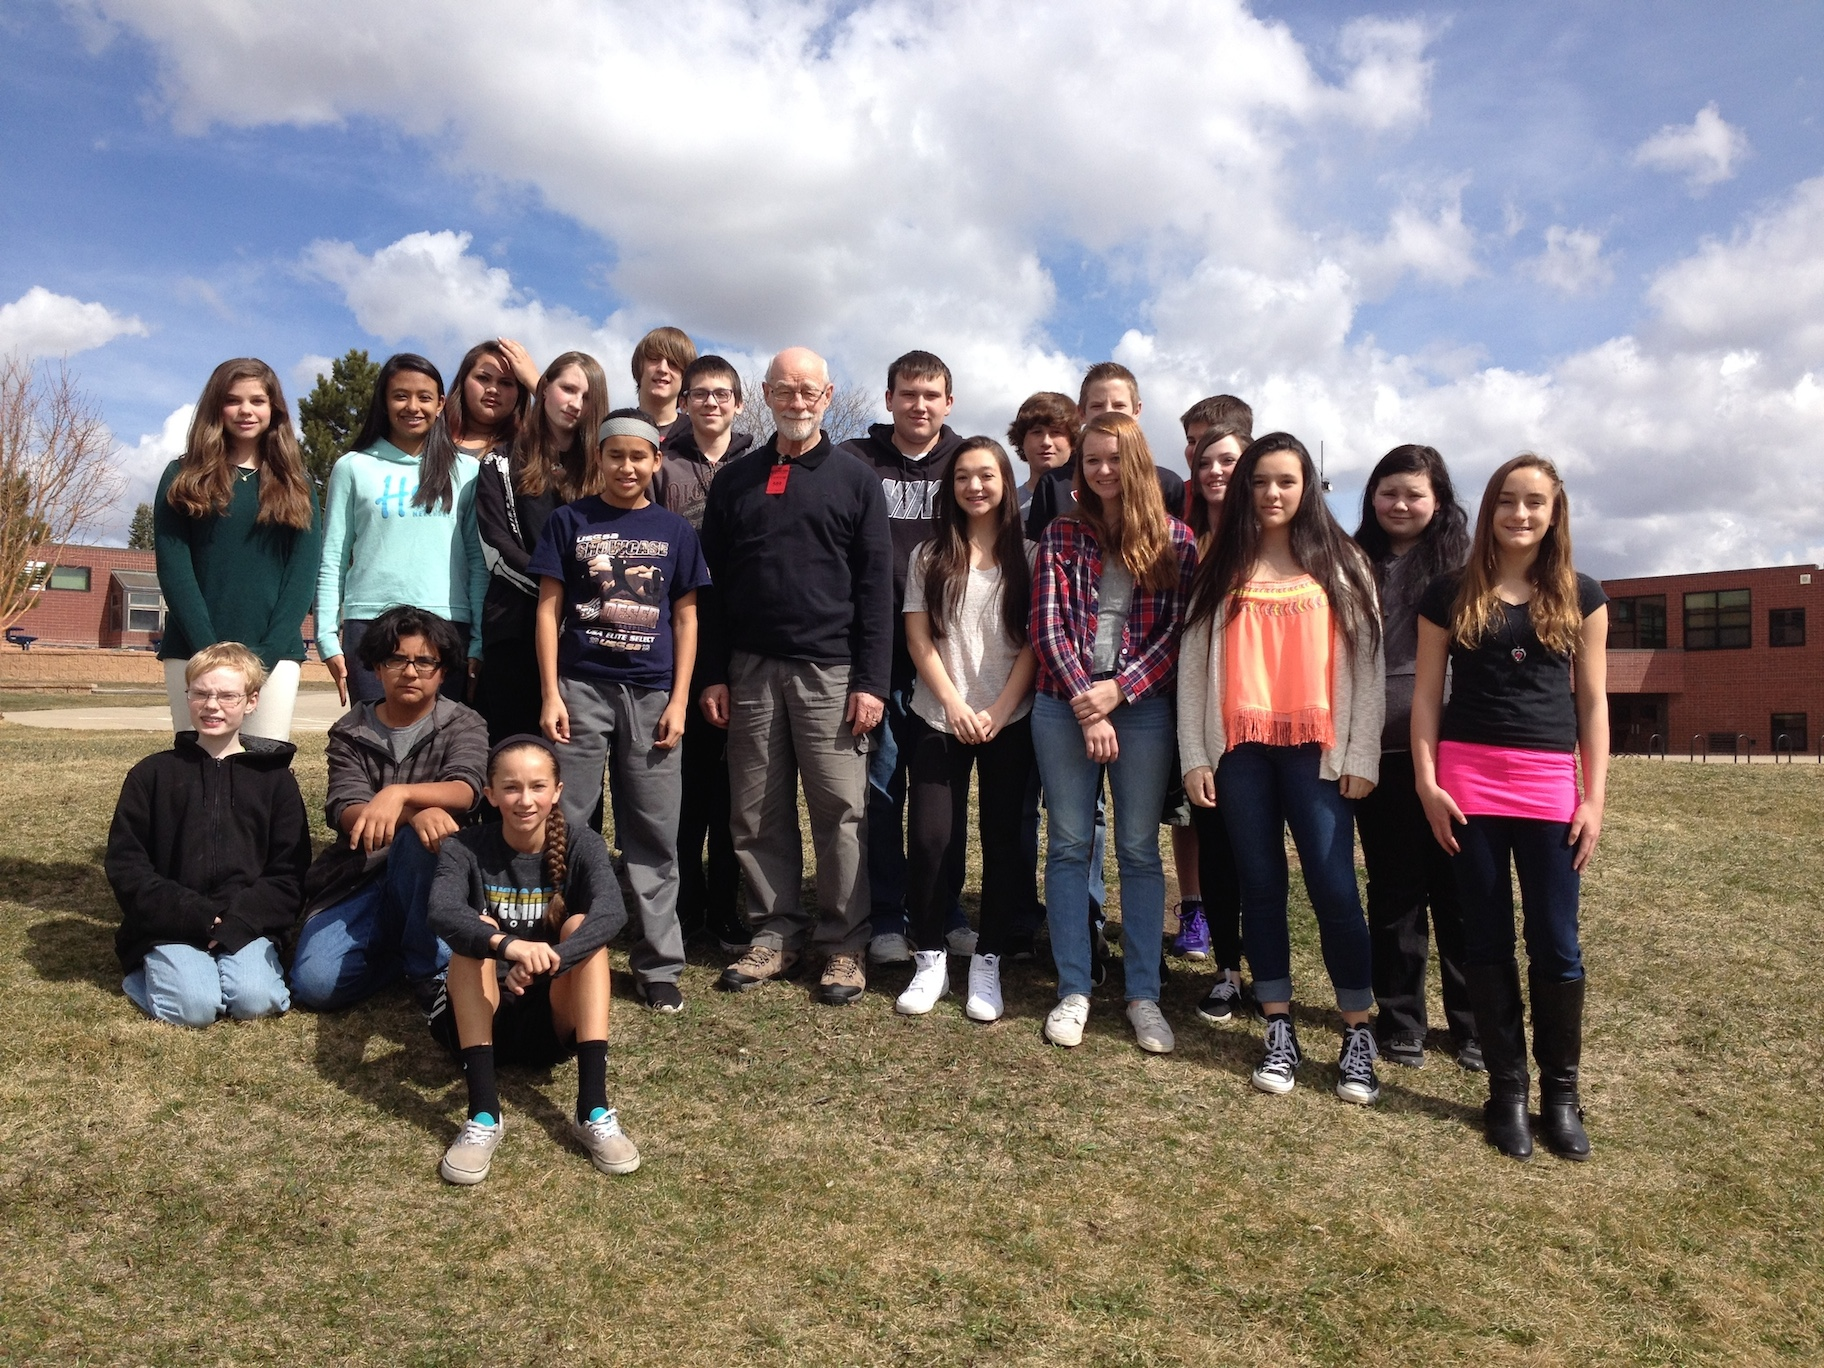 BROOMFIELD HEIGHTS MIDDLE SCHOOL